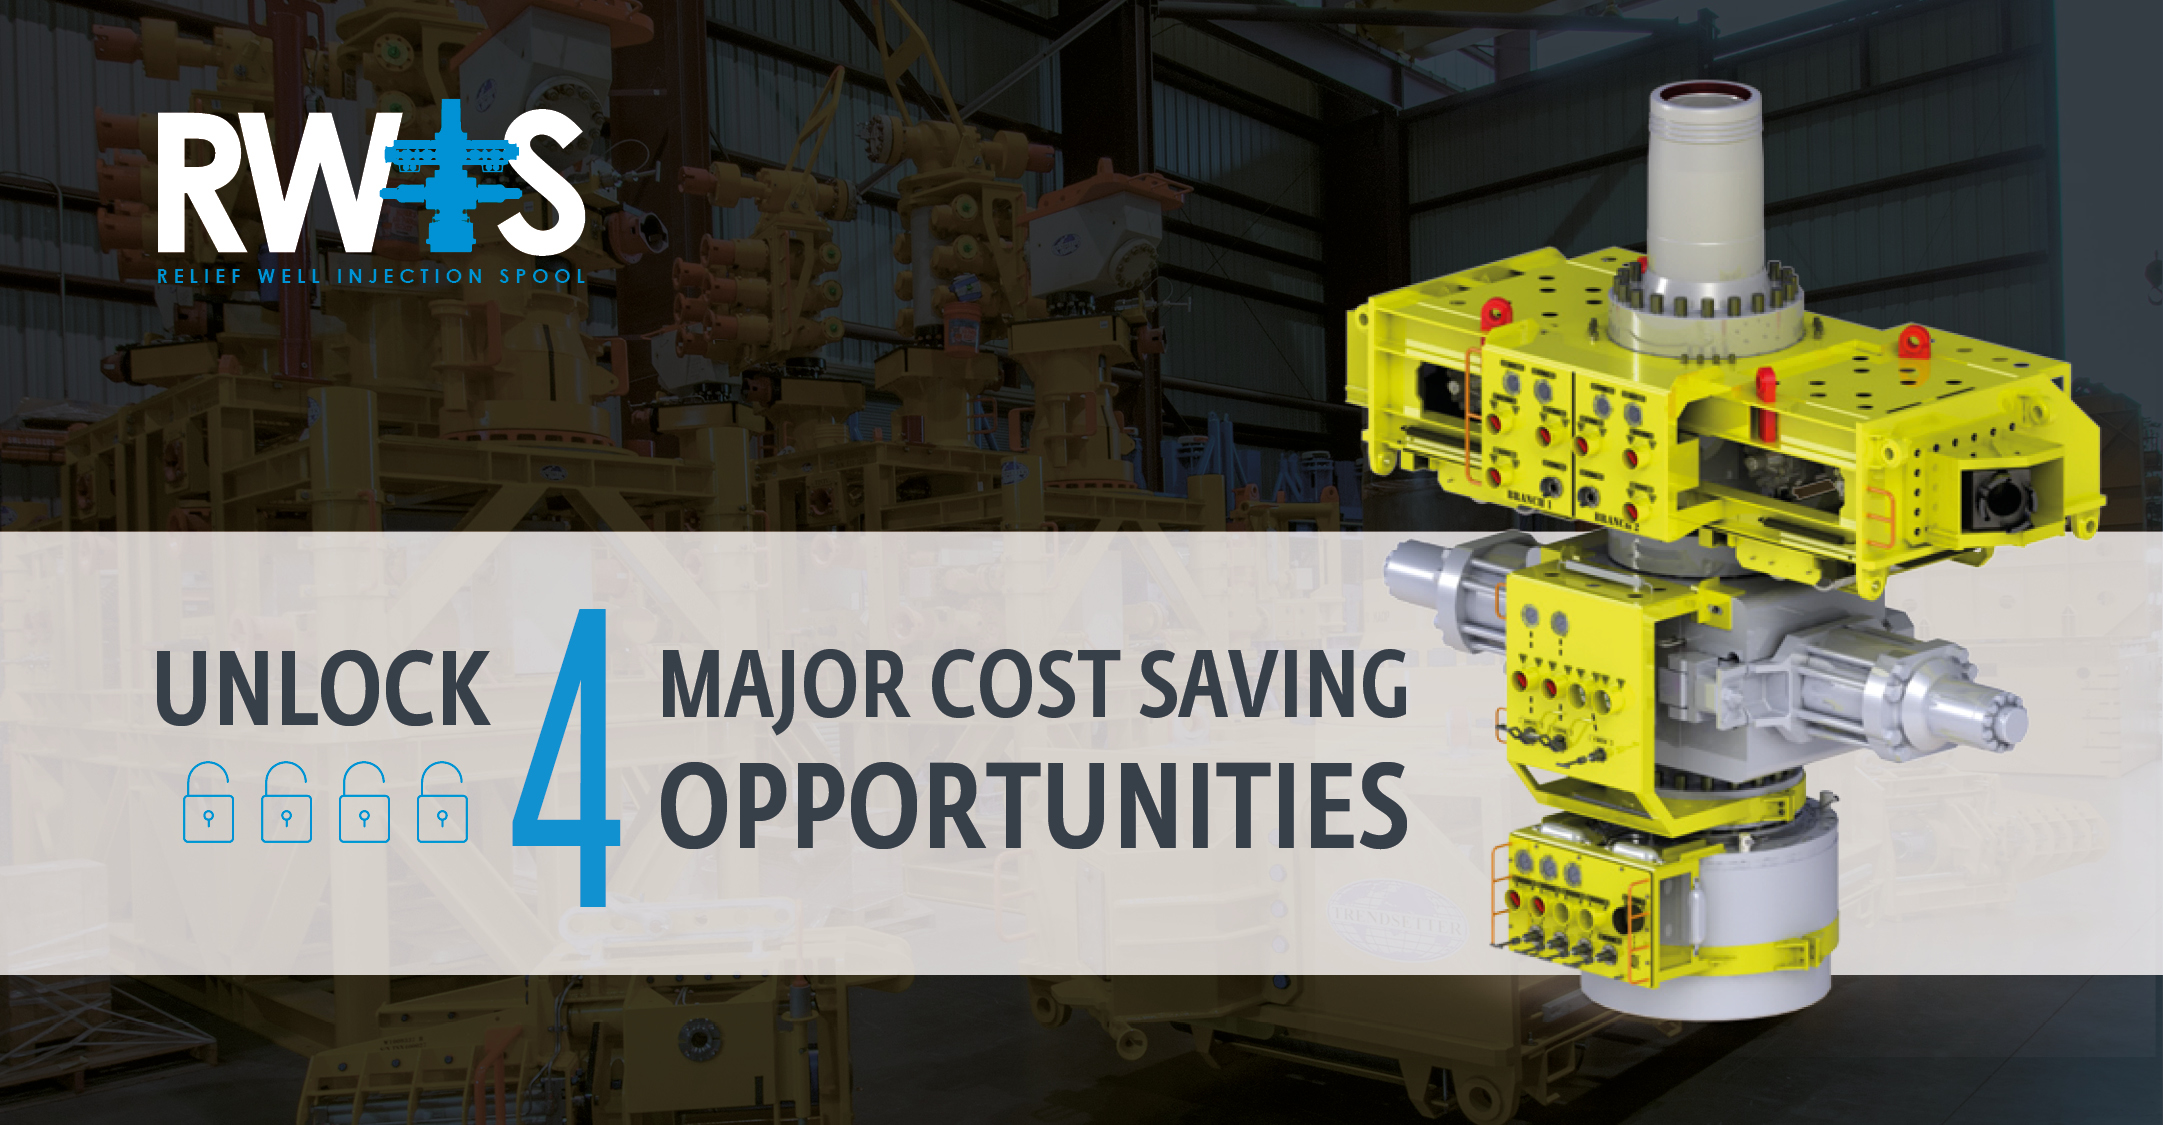 AL_Linkedin_5_Major_Cost_Savings_using_the_RWIS3